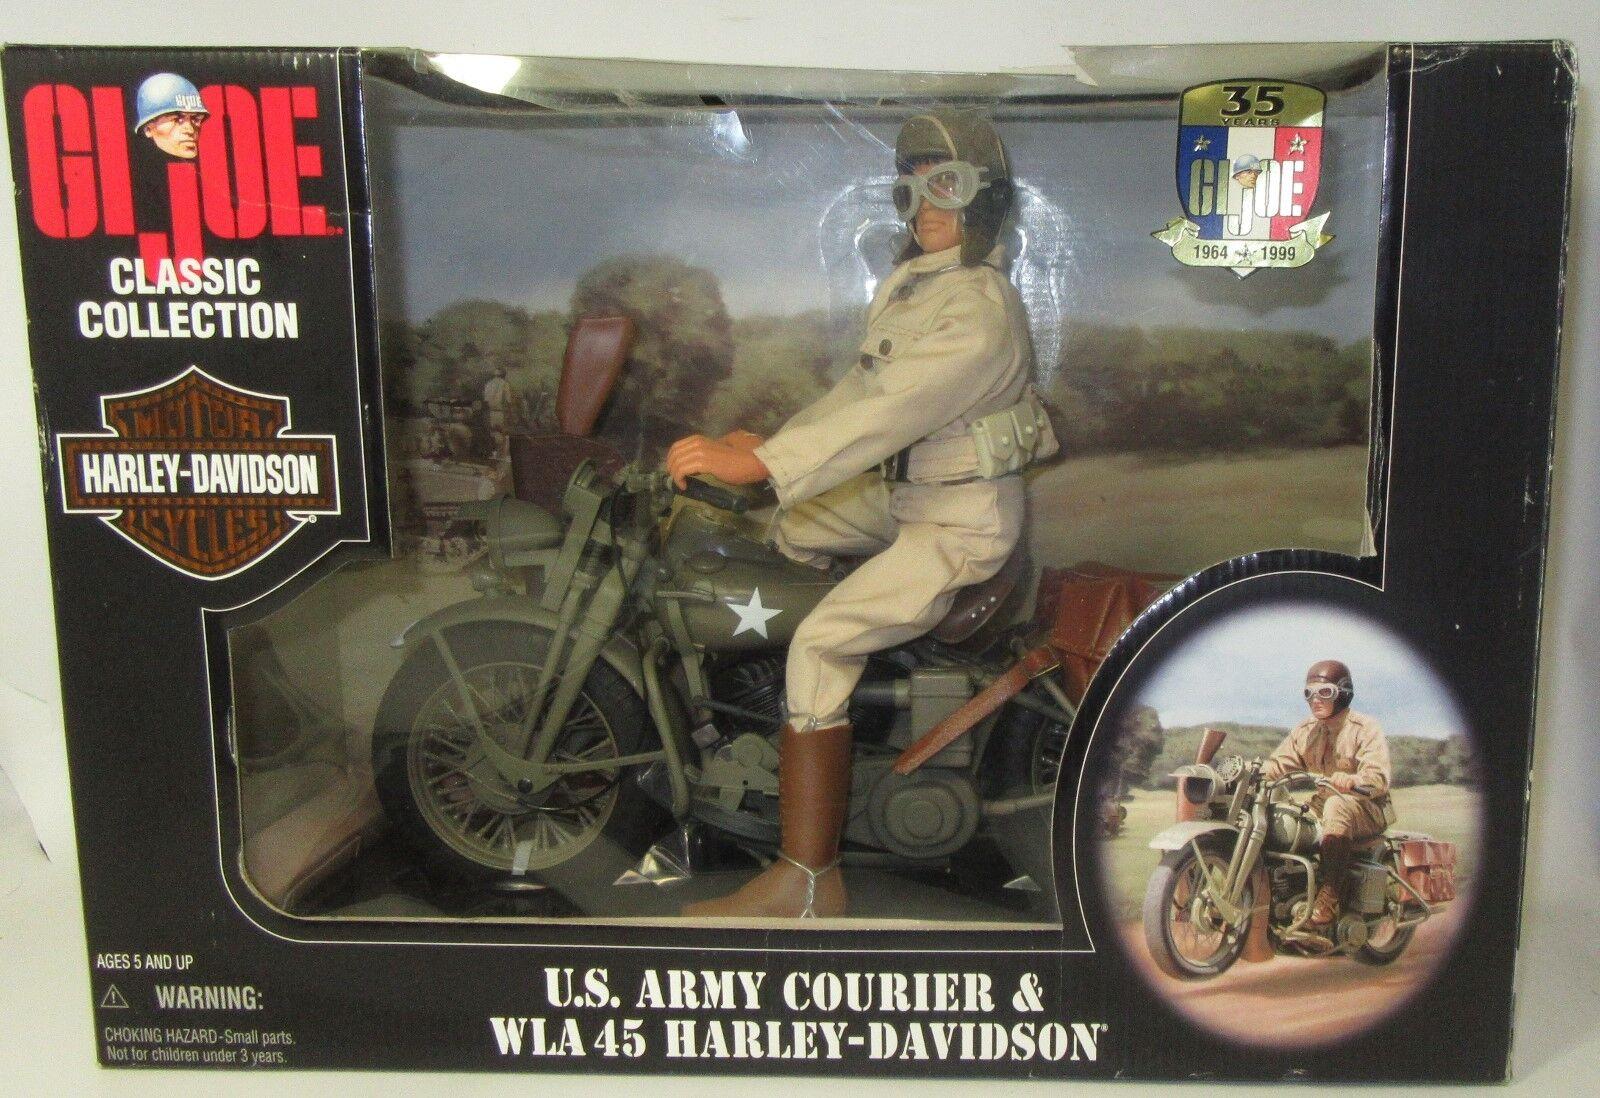 GI JOE US ARMY Courier & WLA 45 HARLEY DAVIDSON MOTORCYCLE DISPATCH RIDER In Box